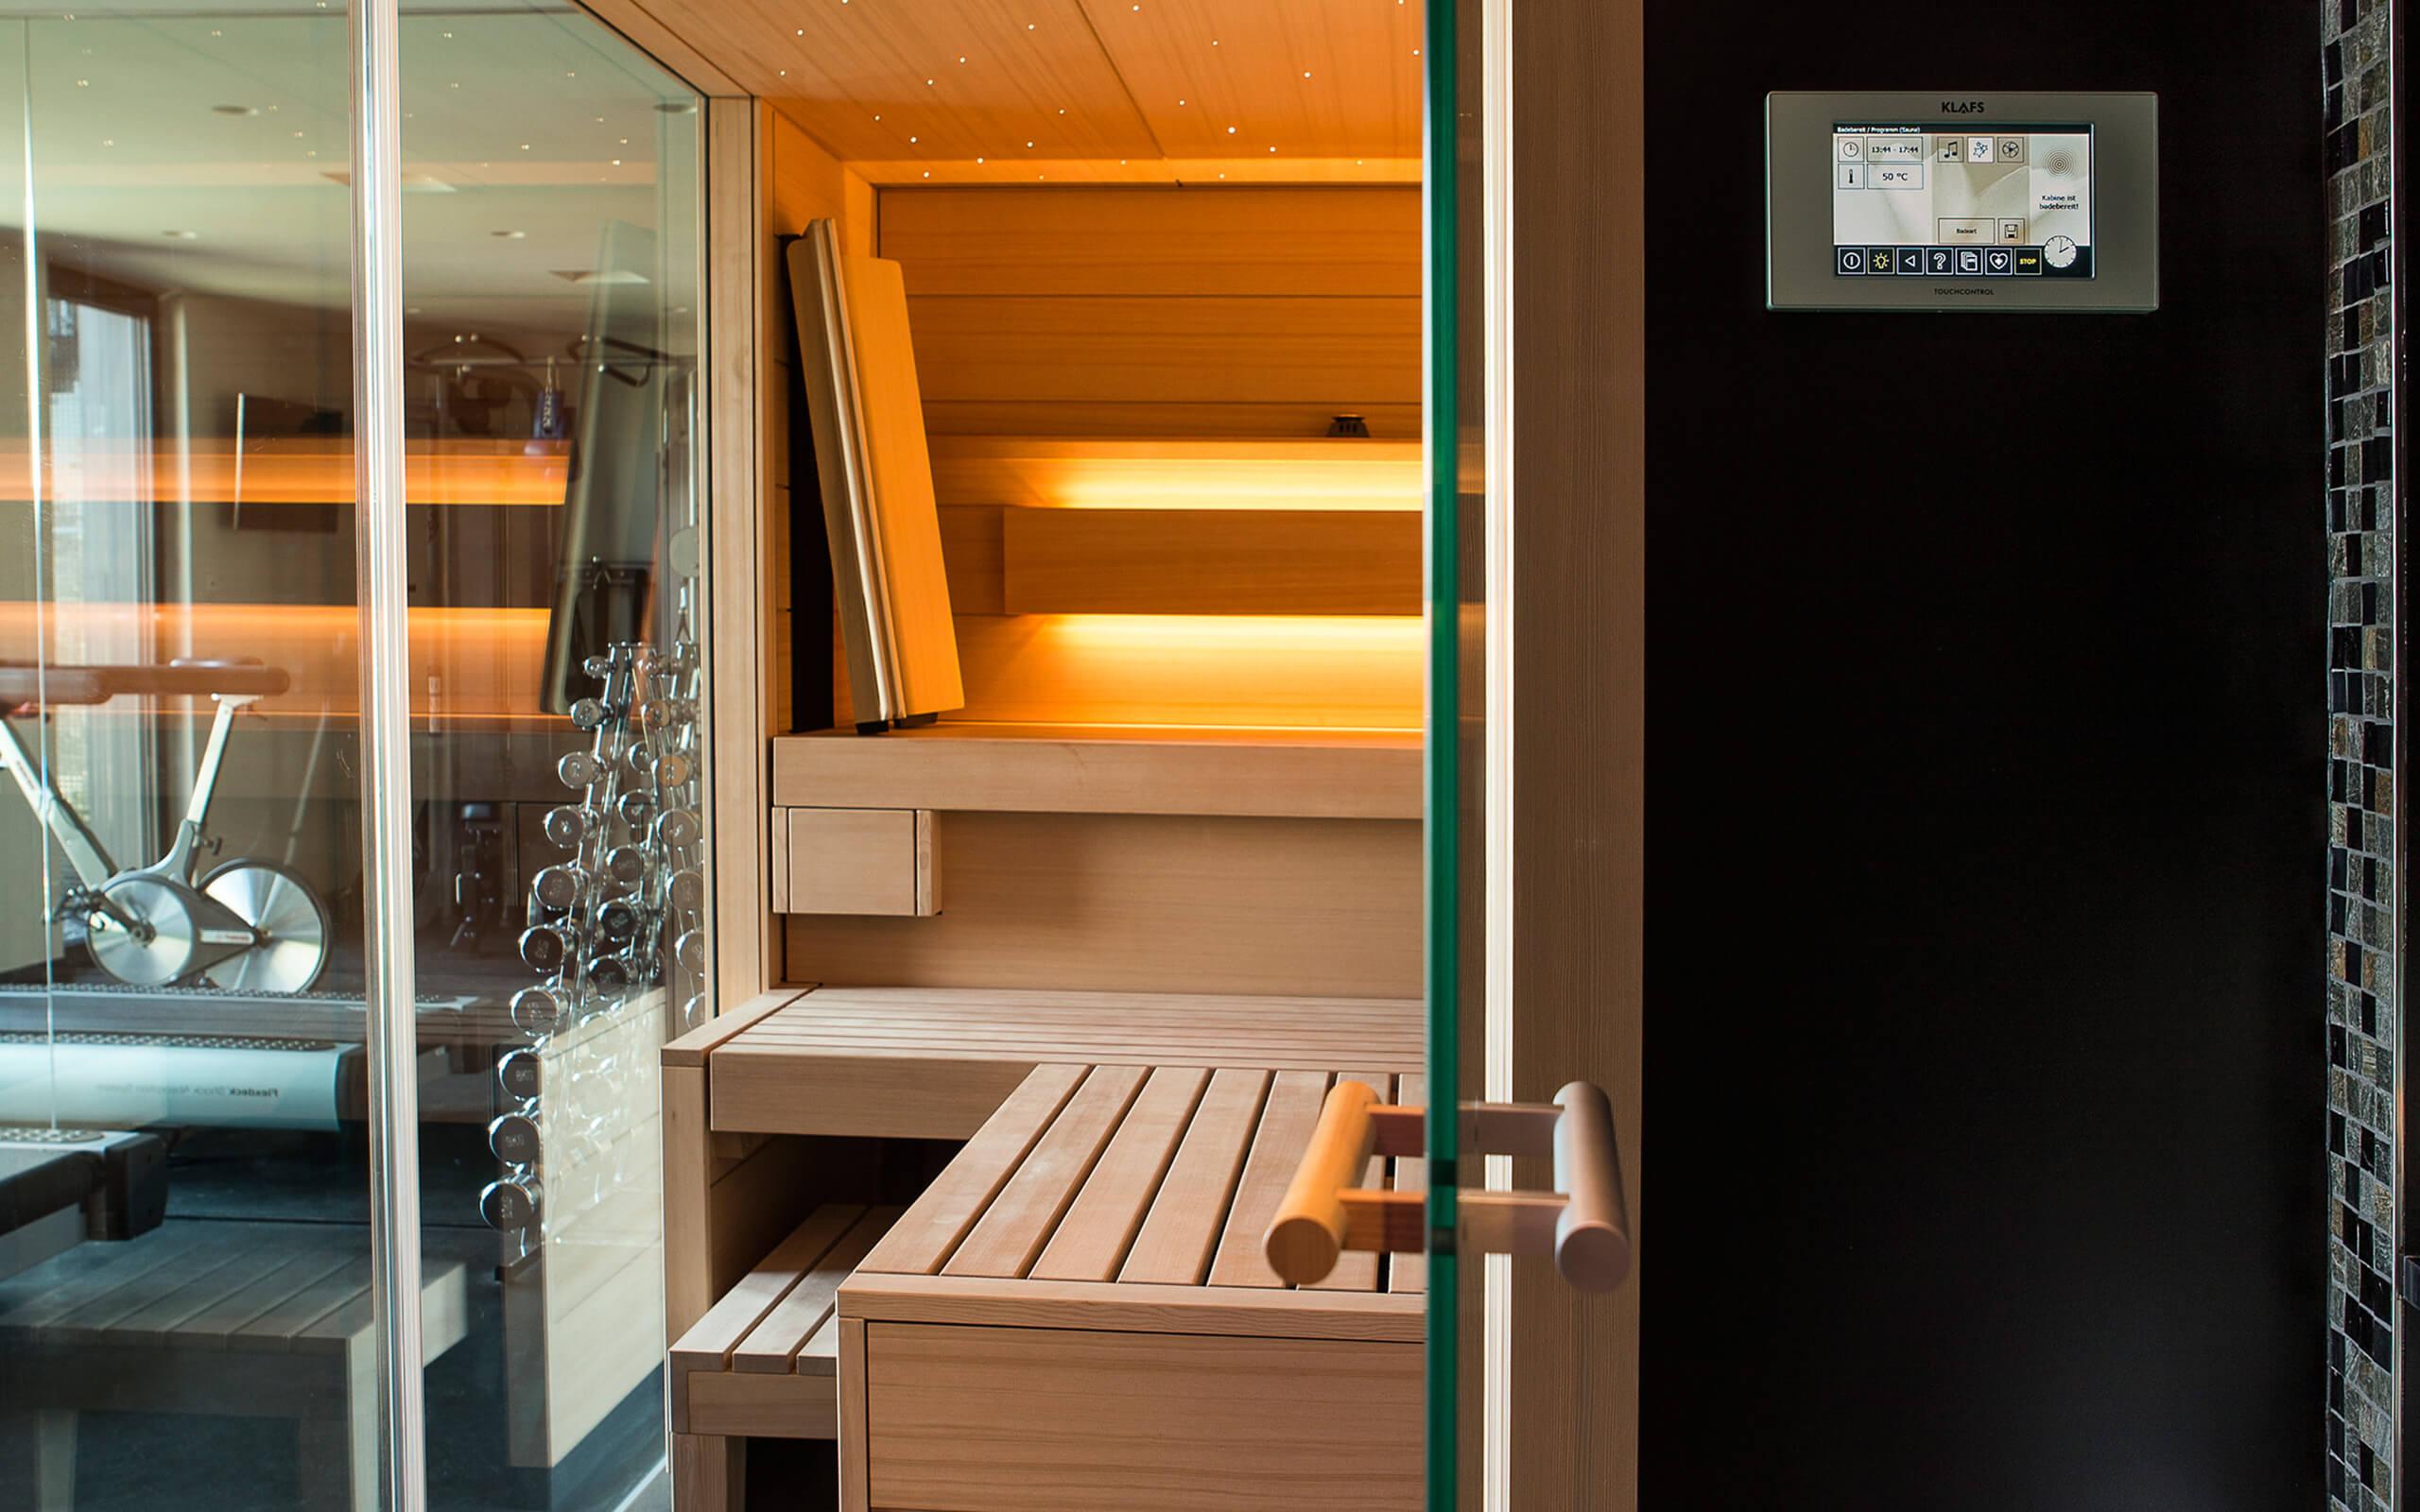 ostvareni snovi romana wiedenfellera klafs gmbh co kg. Black Bedroom Furniture Sets. Home Design Ideas